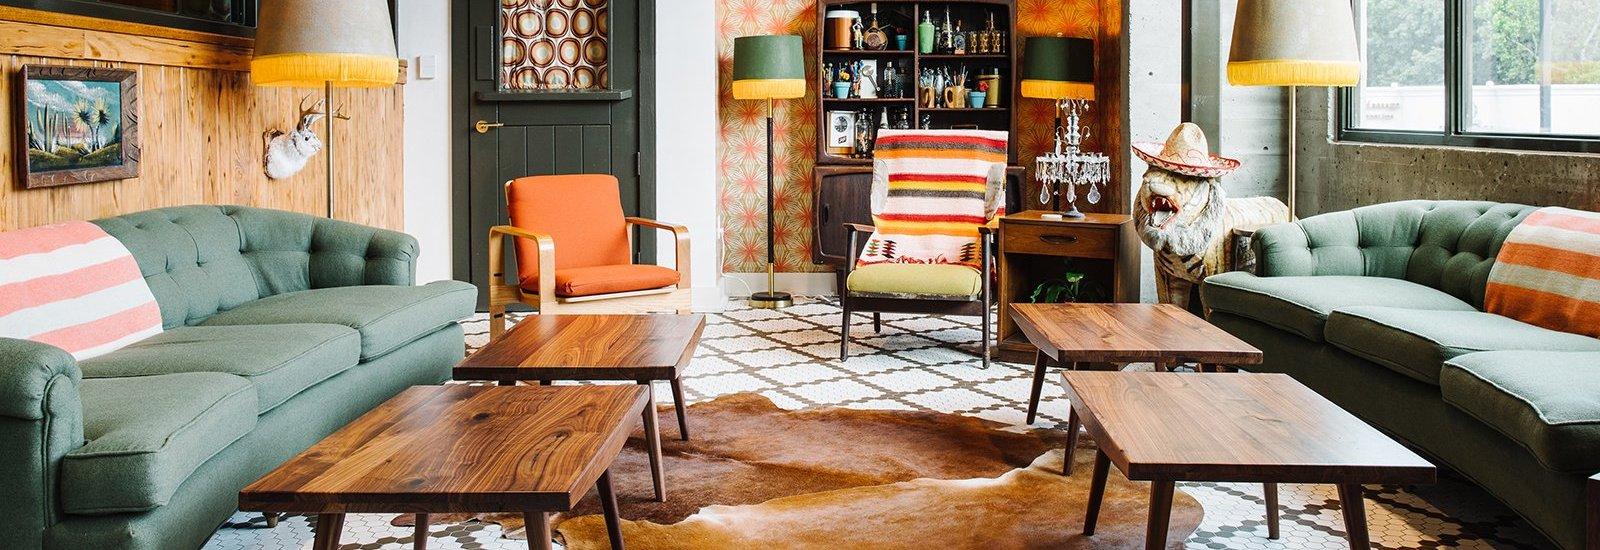 Modern Vintage Interiors Inspiration From Elizabeth Ingram